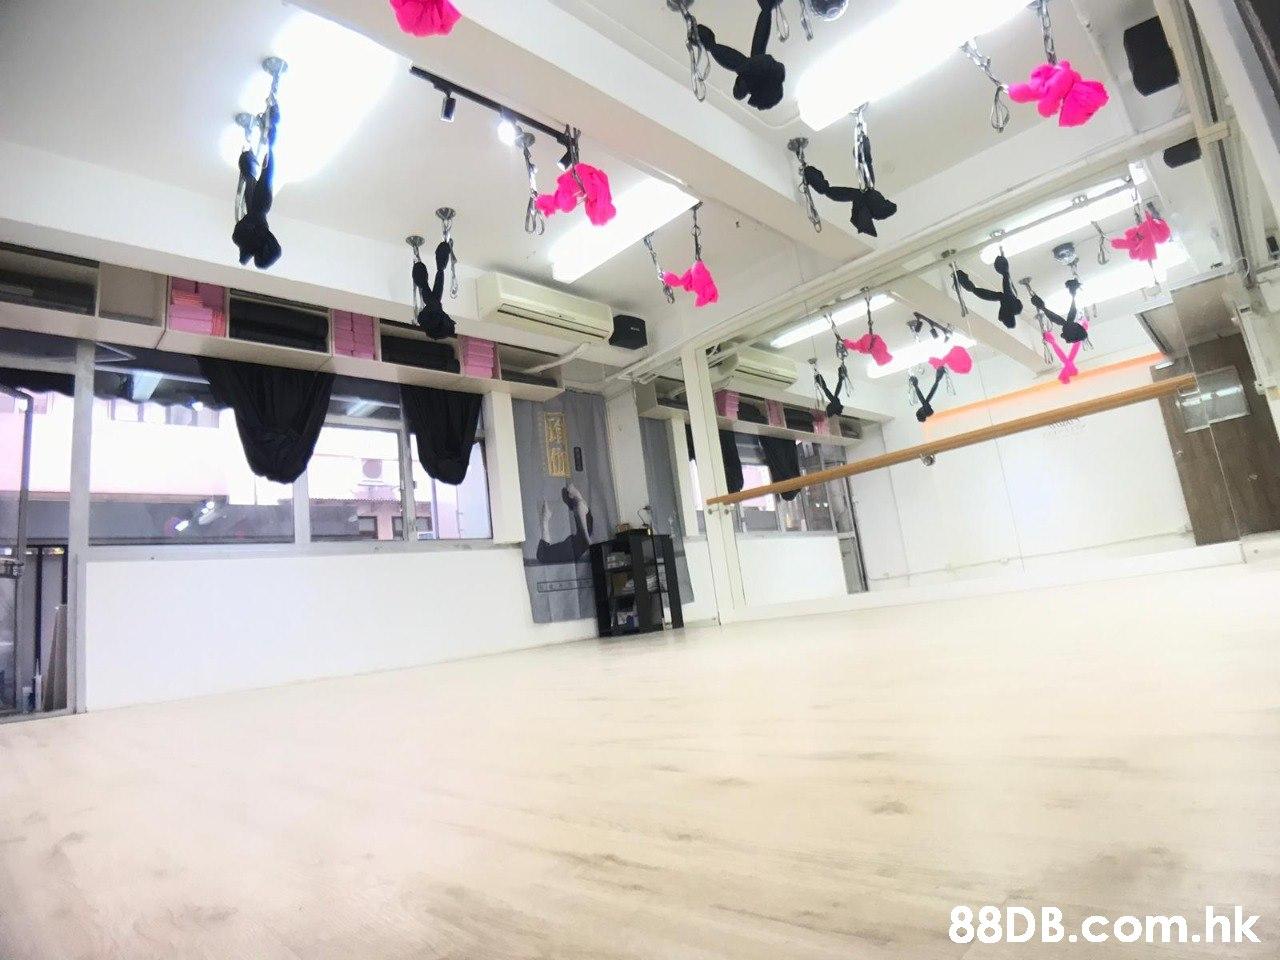 .hk  Property,Building,Ceiling,Floor,Room